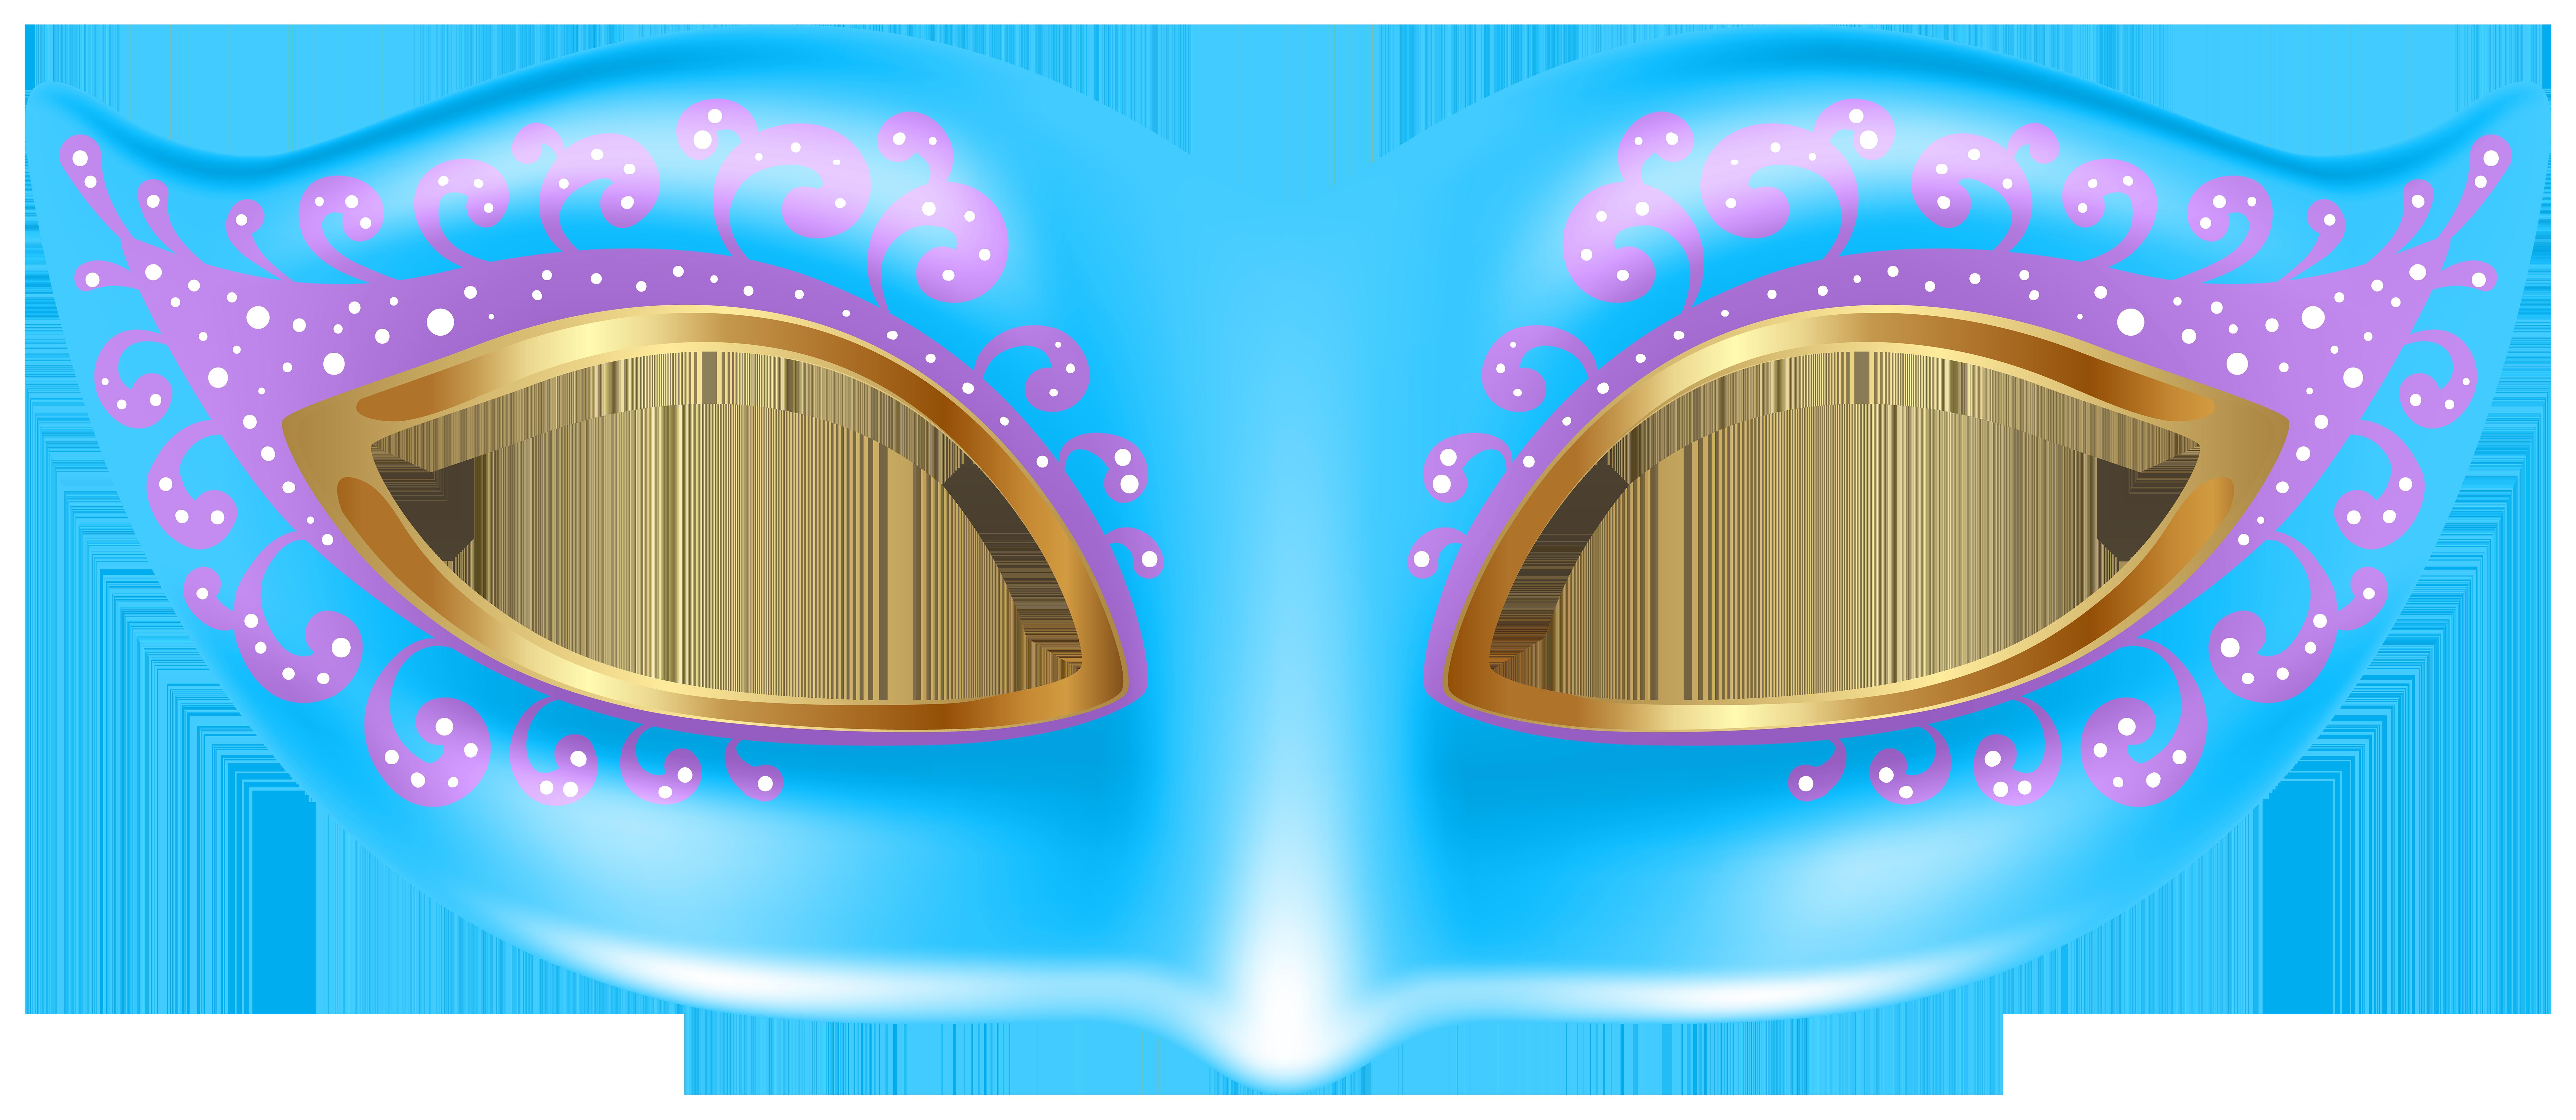 8000x3477 Blue Mask Transparent Png Clip Art Imageu200b Gallery Yopriceville